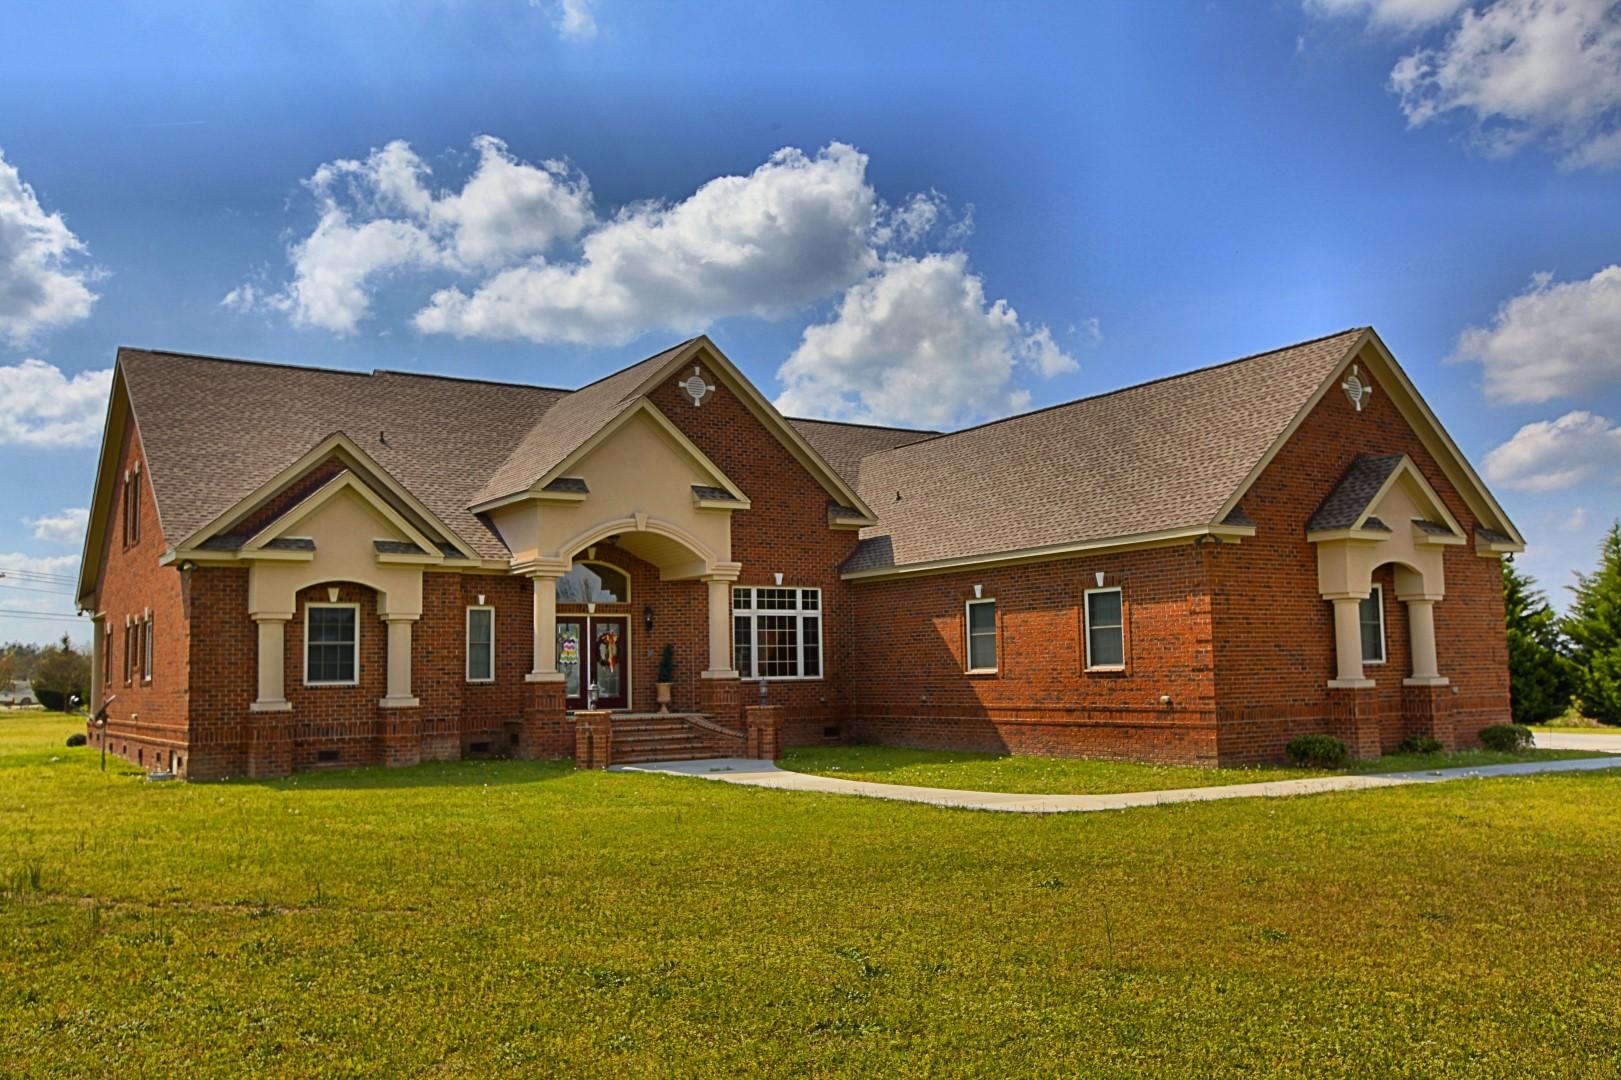 171 Hawks Nest Circle, Pembroke, North Carolina 28372